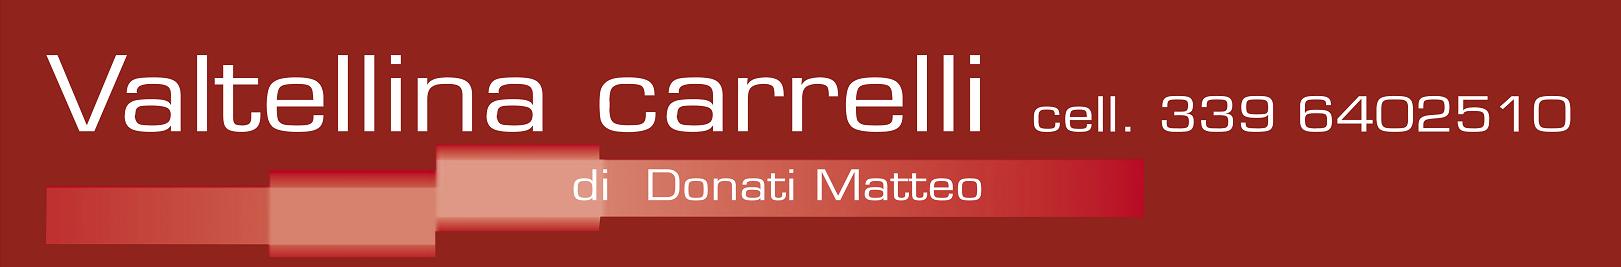 Valtellina Carrelli